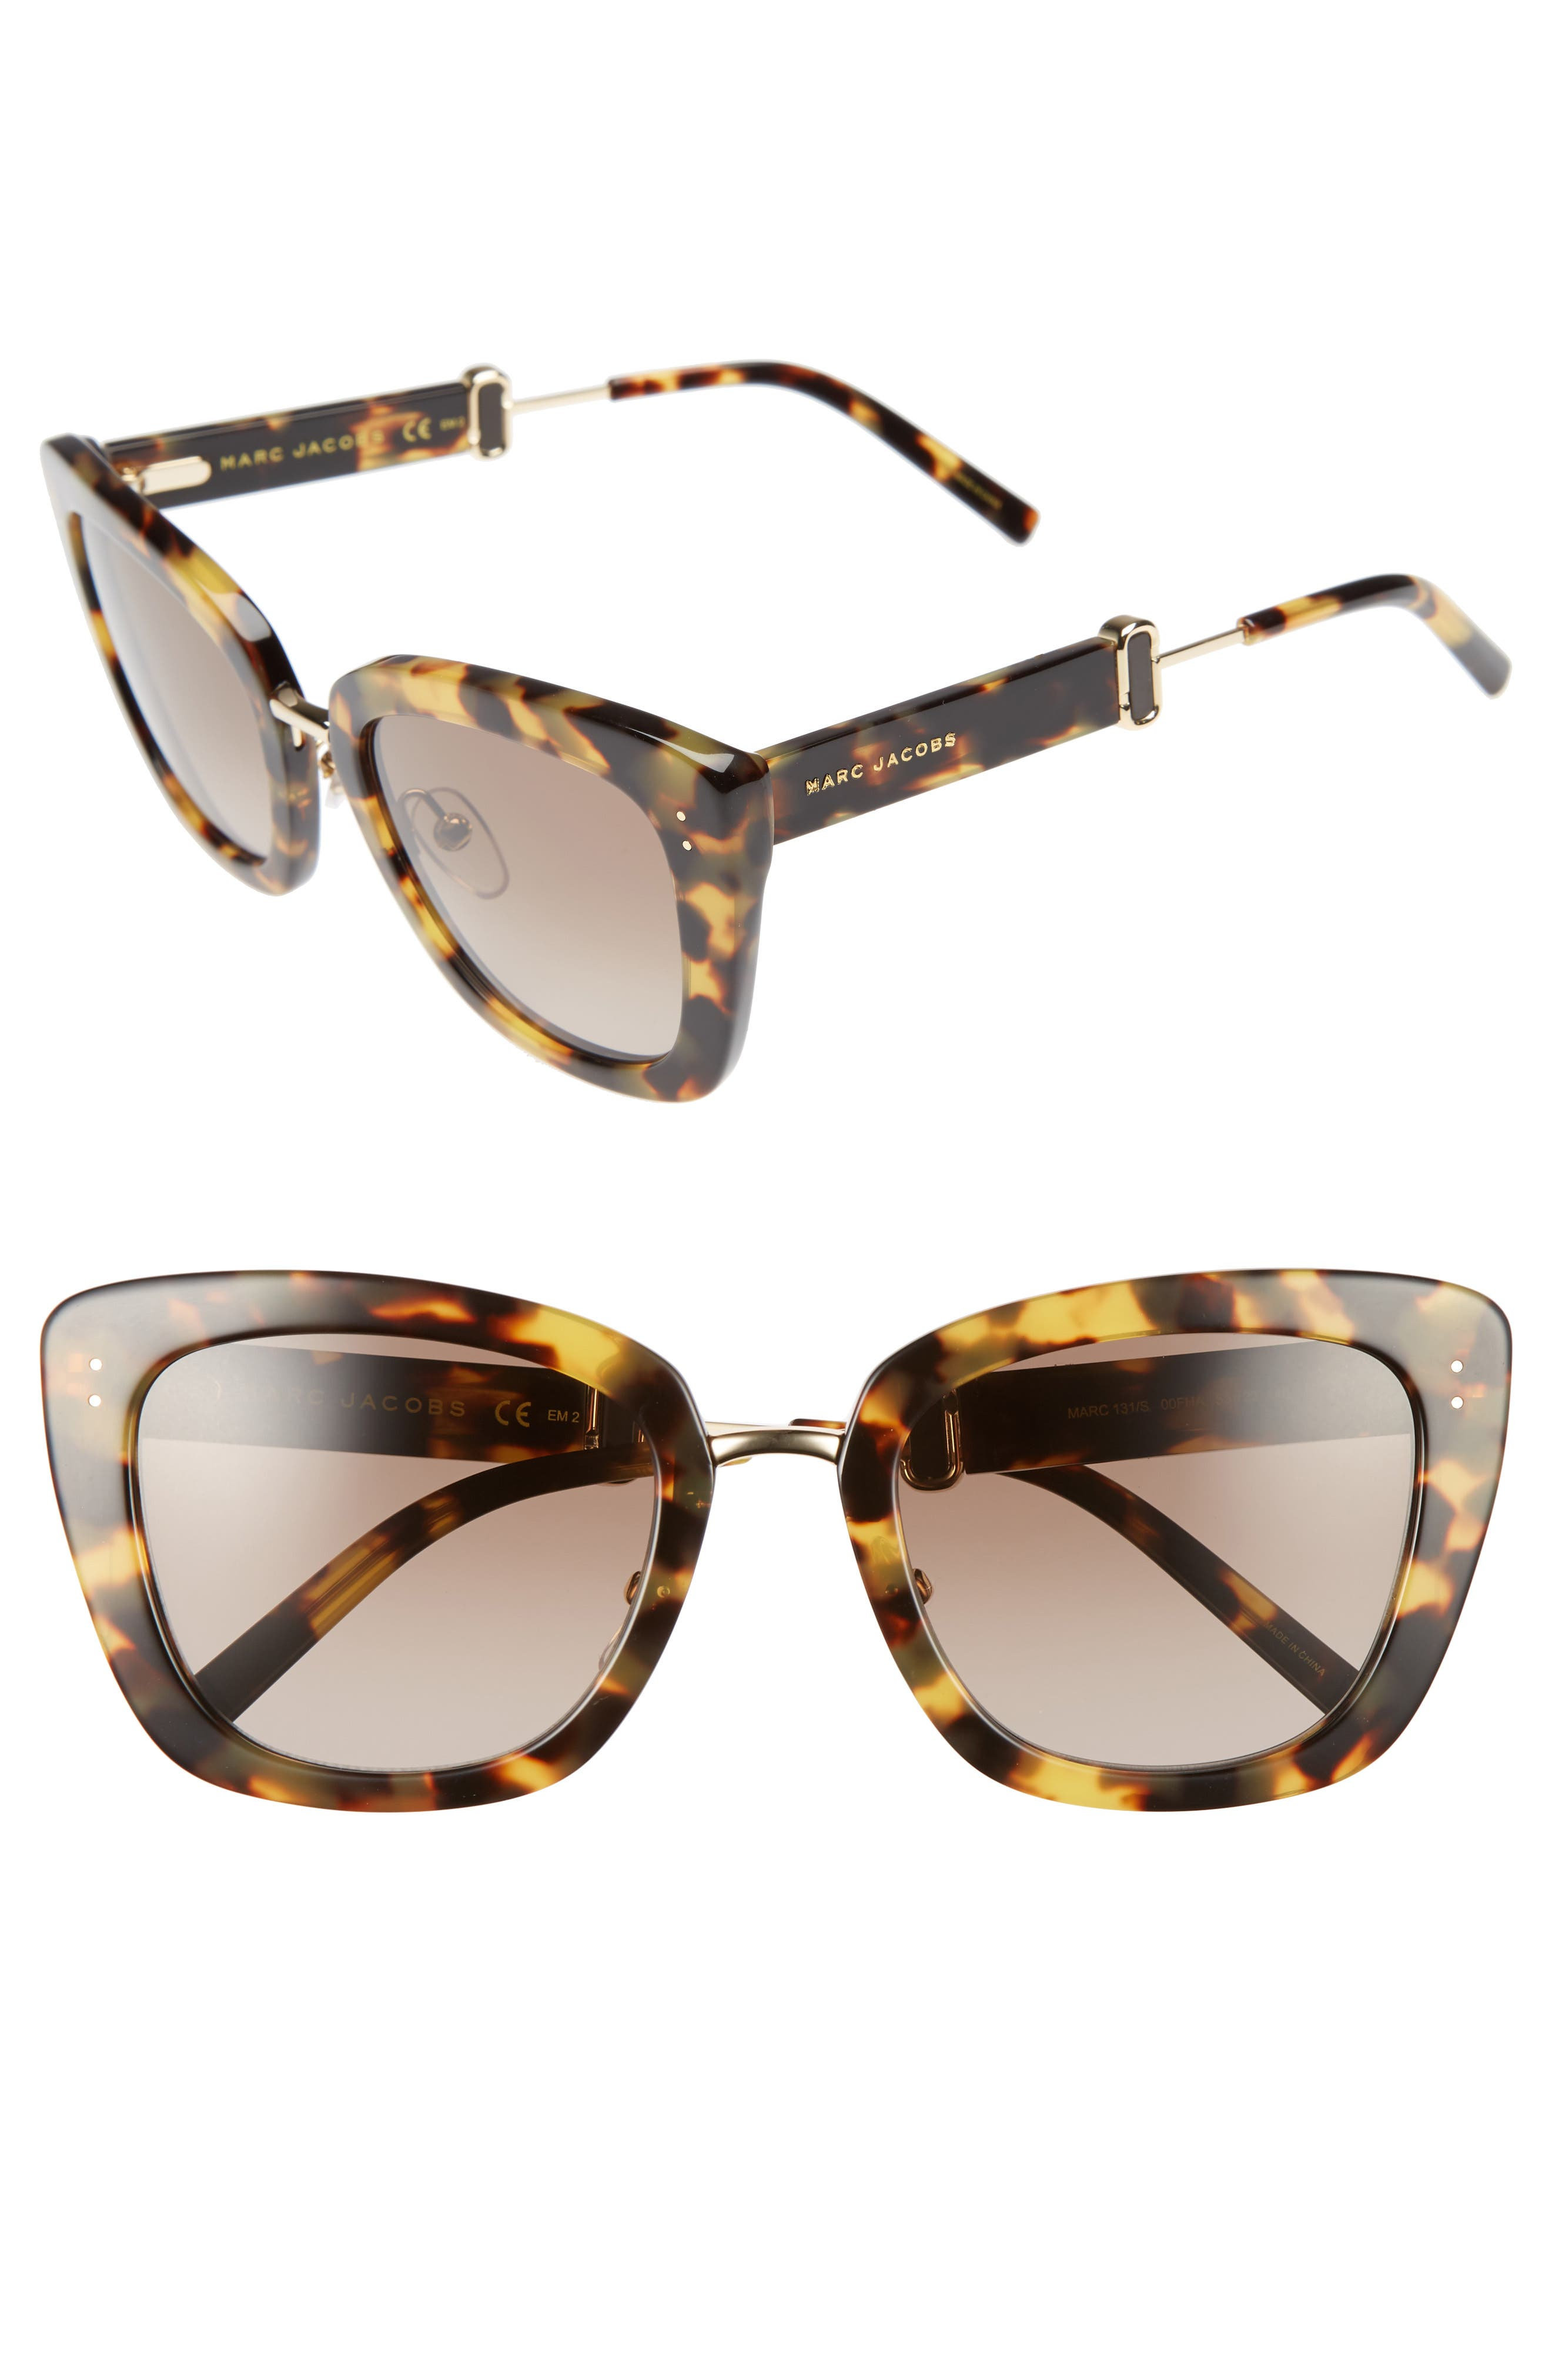 53mm Oversized Sunglasses,                             Alternate thumbnail 4, color,